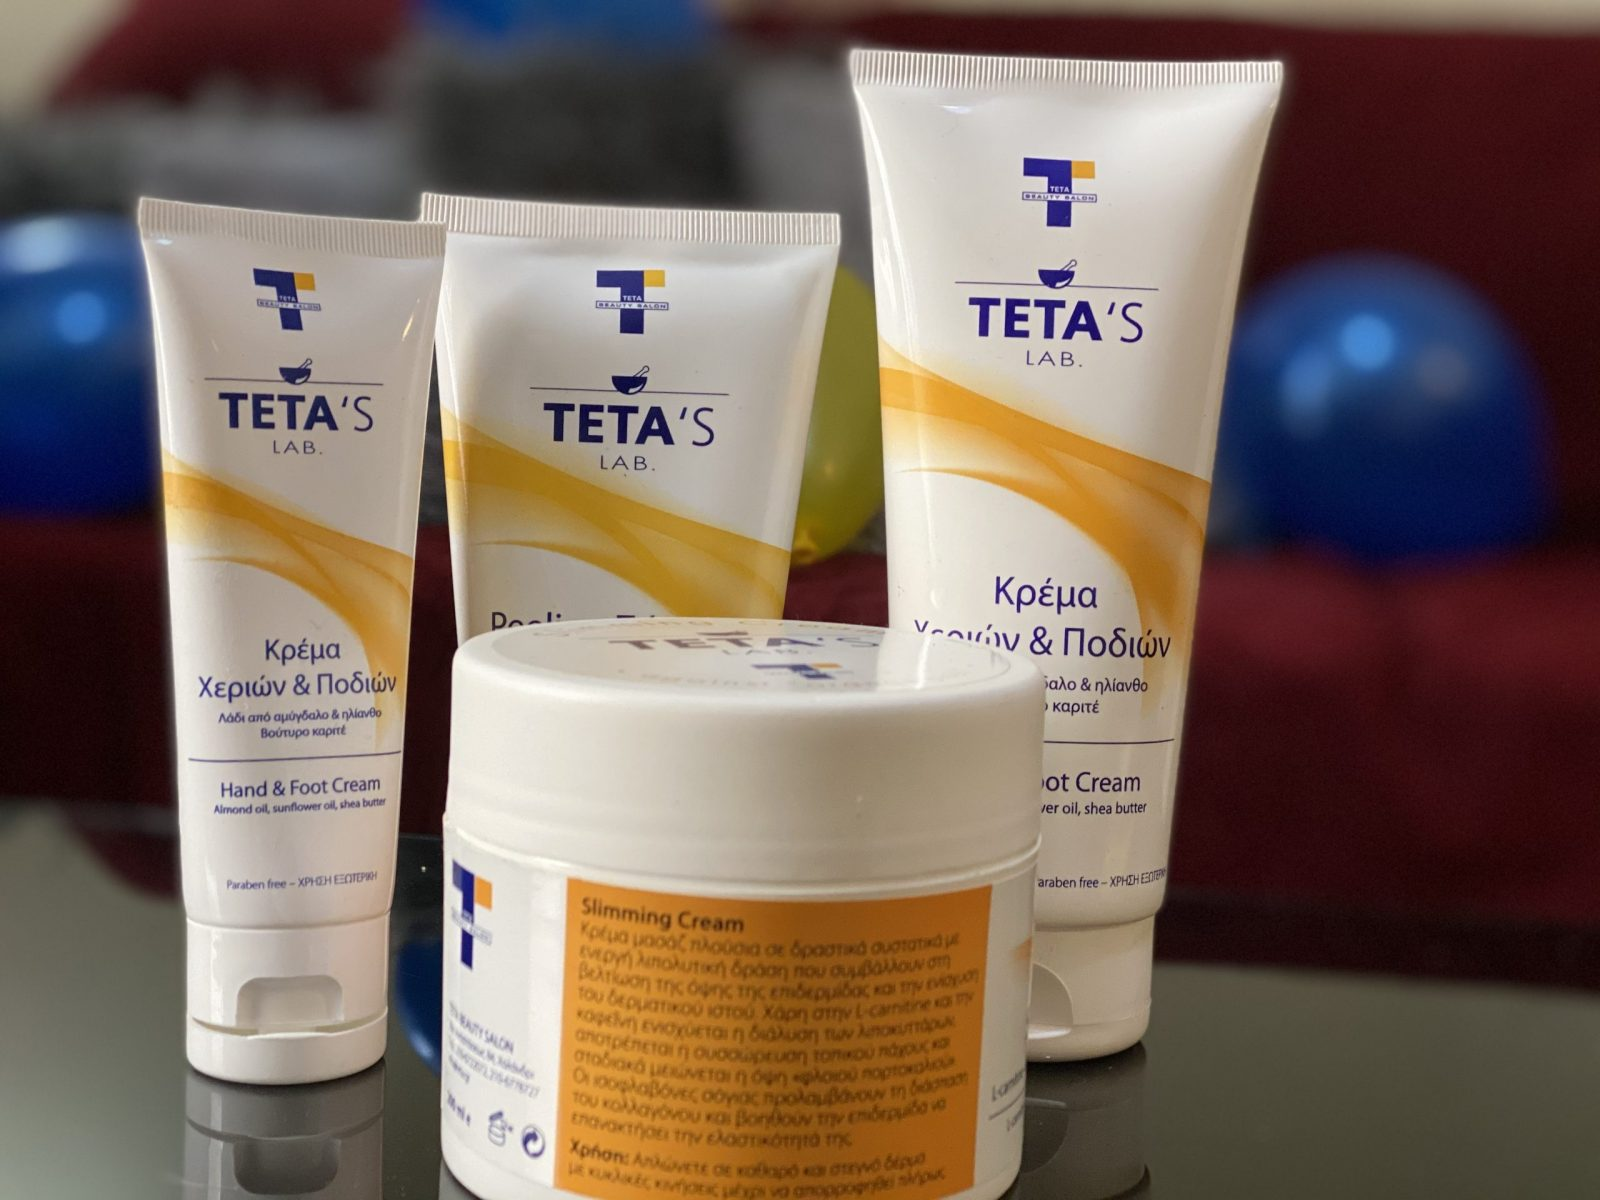 Teta's Lab